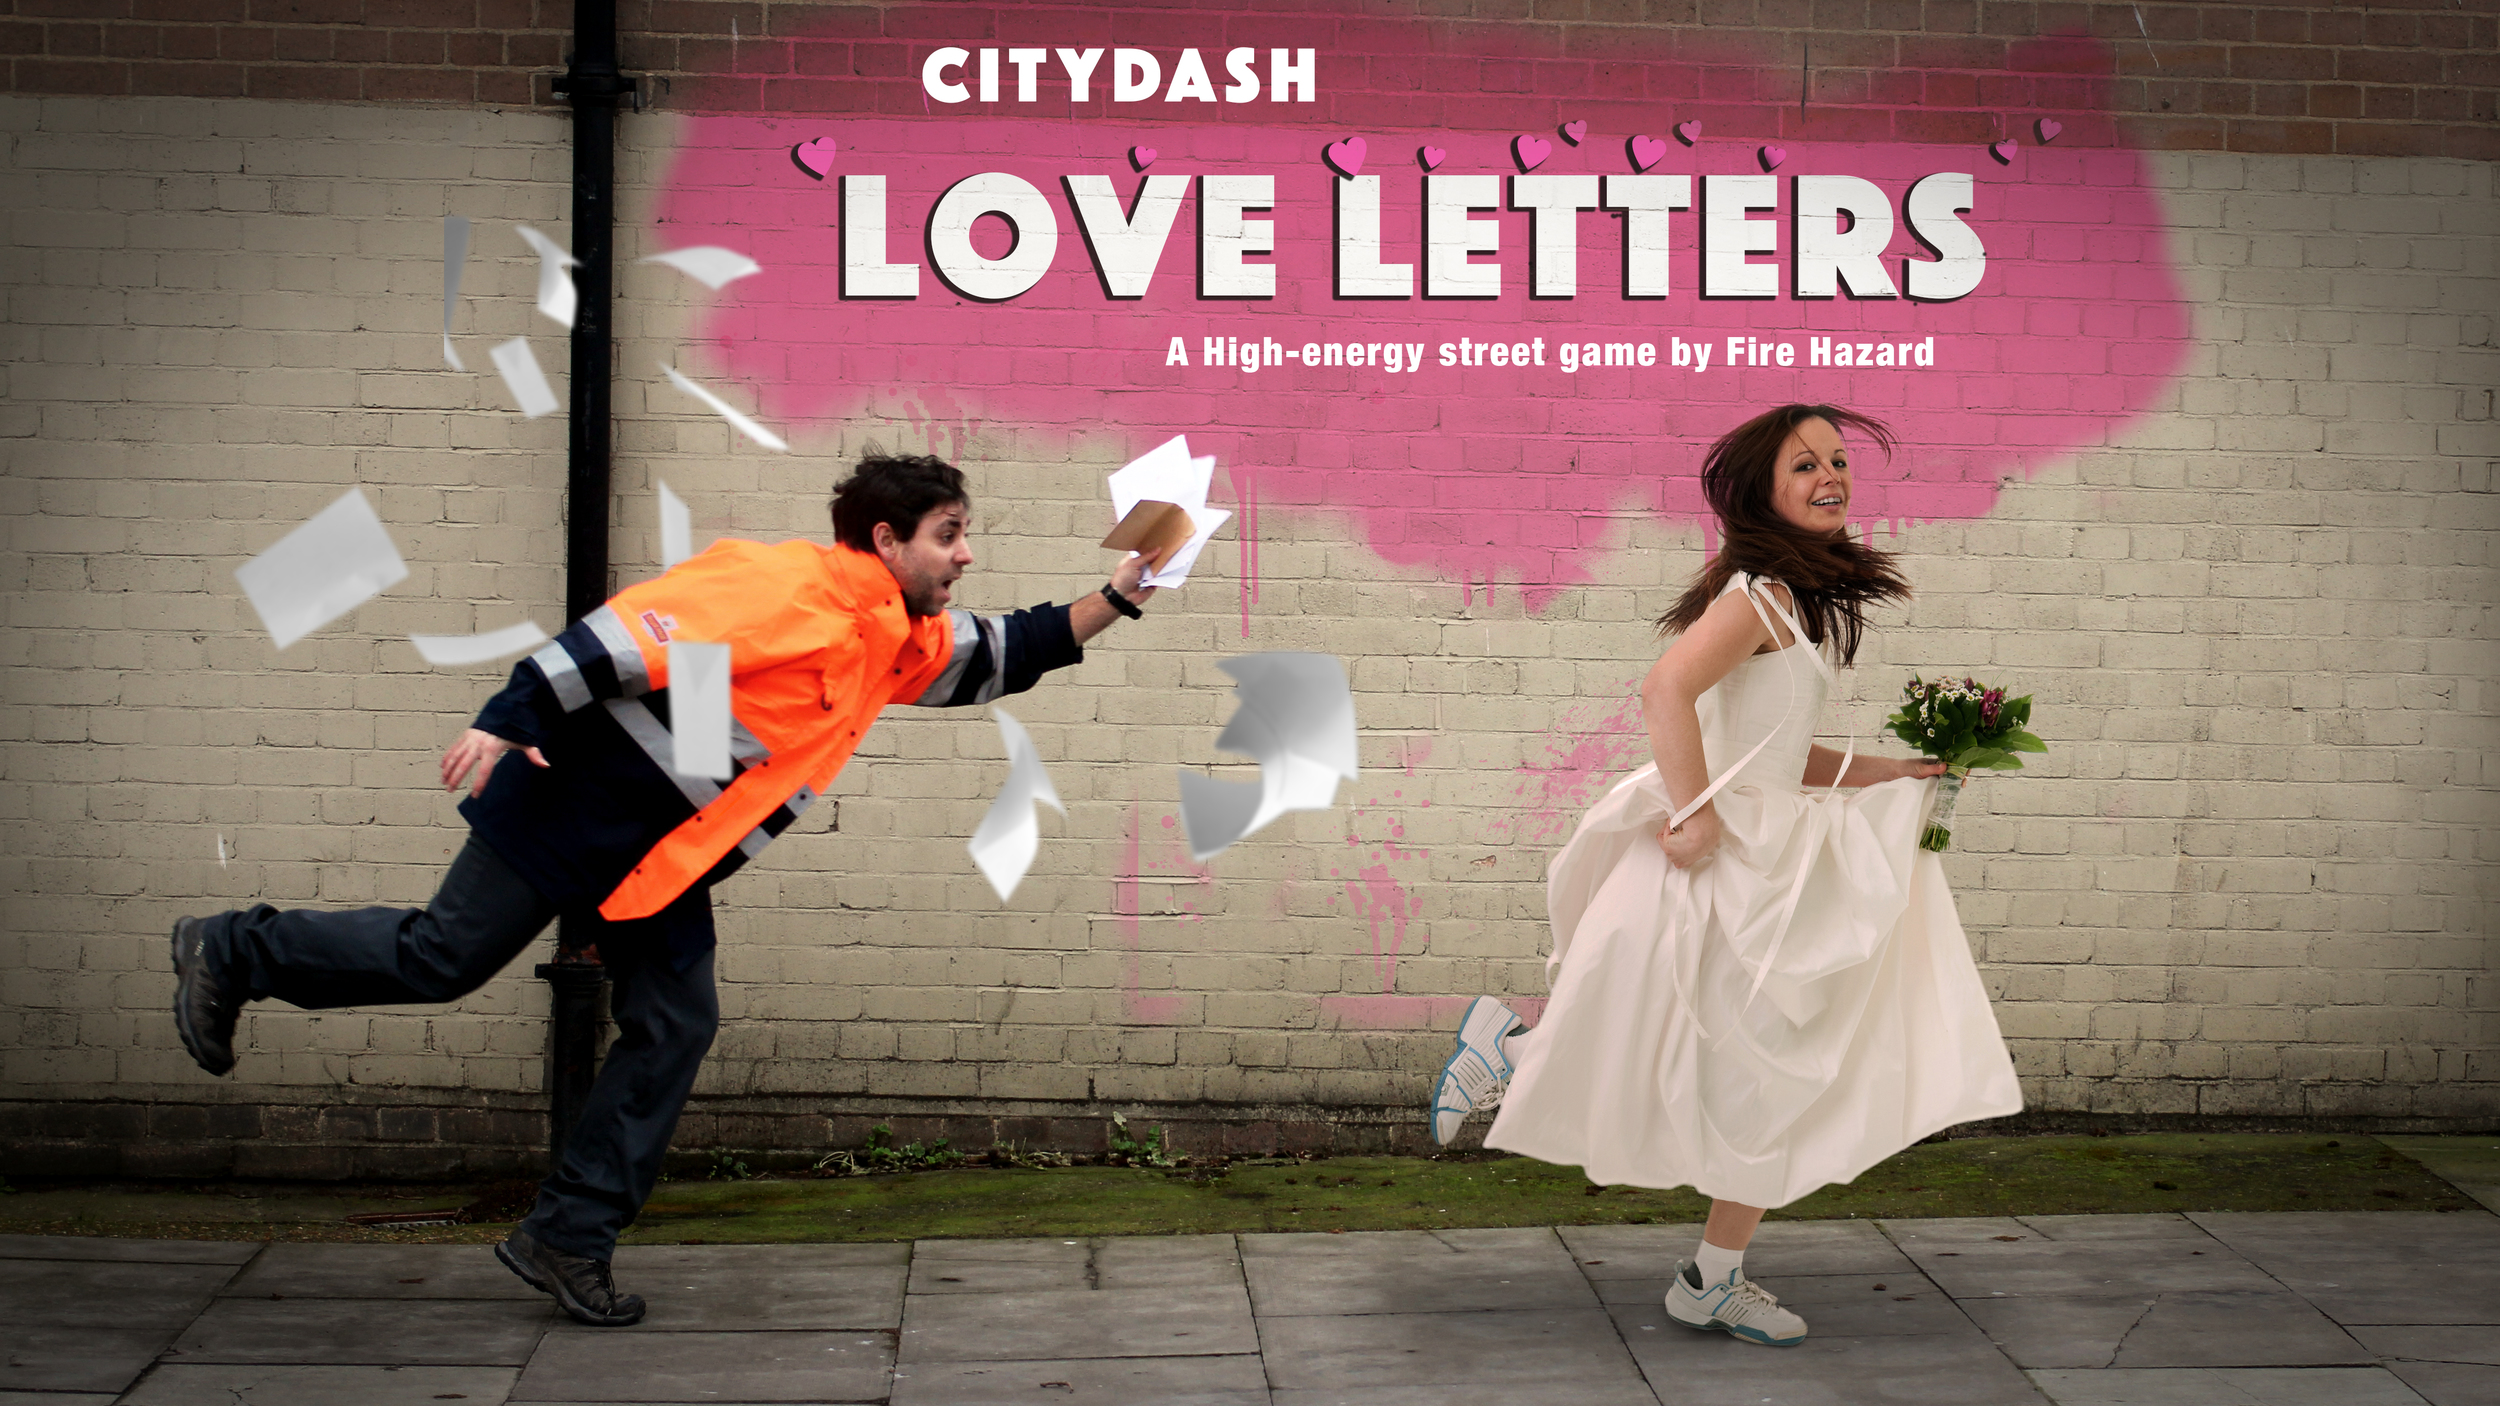 citydash love letters promo image 2.jpg